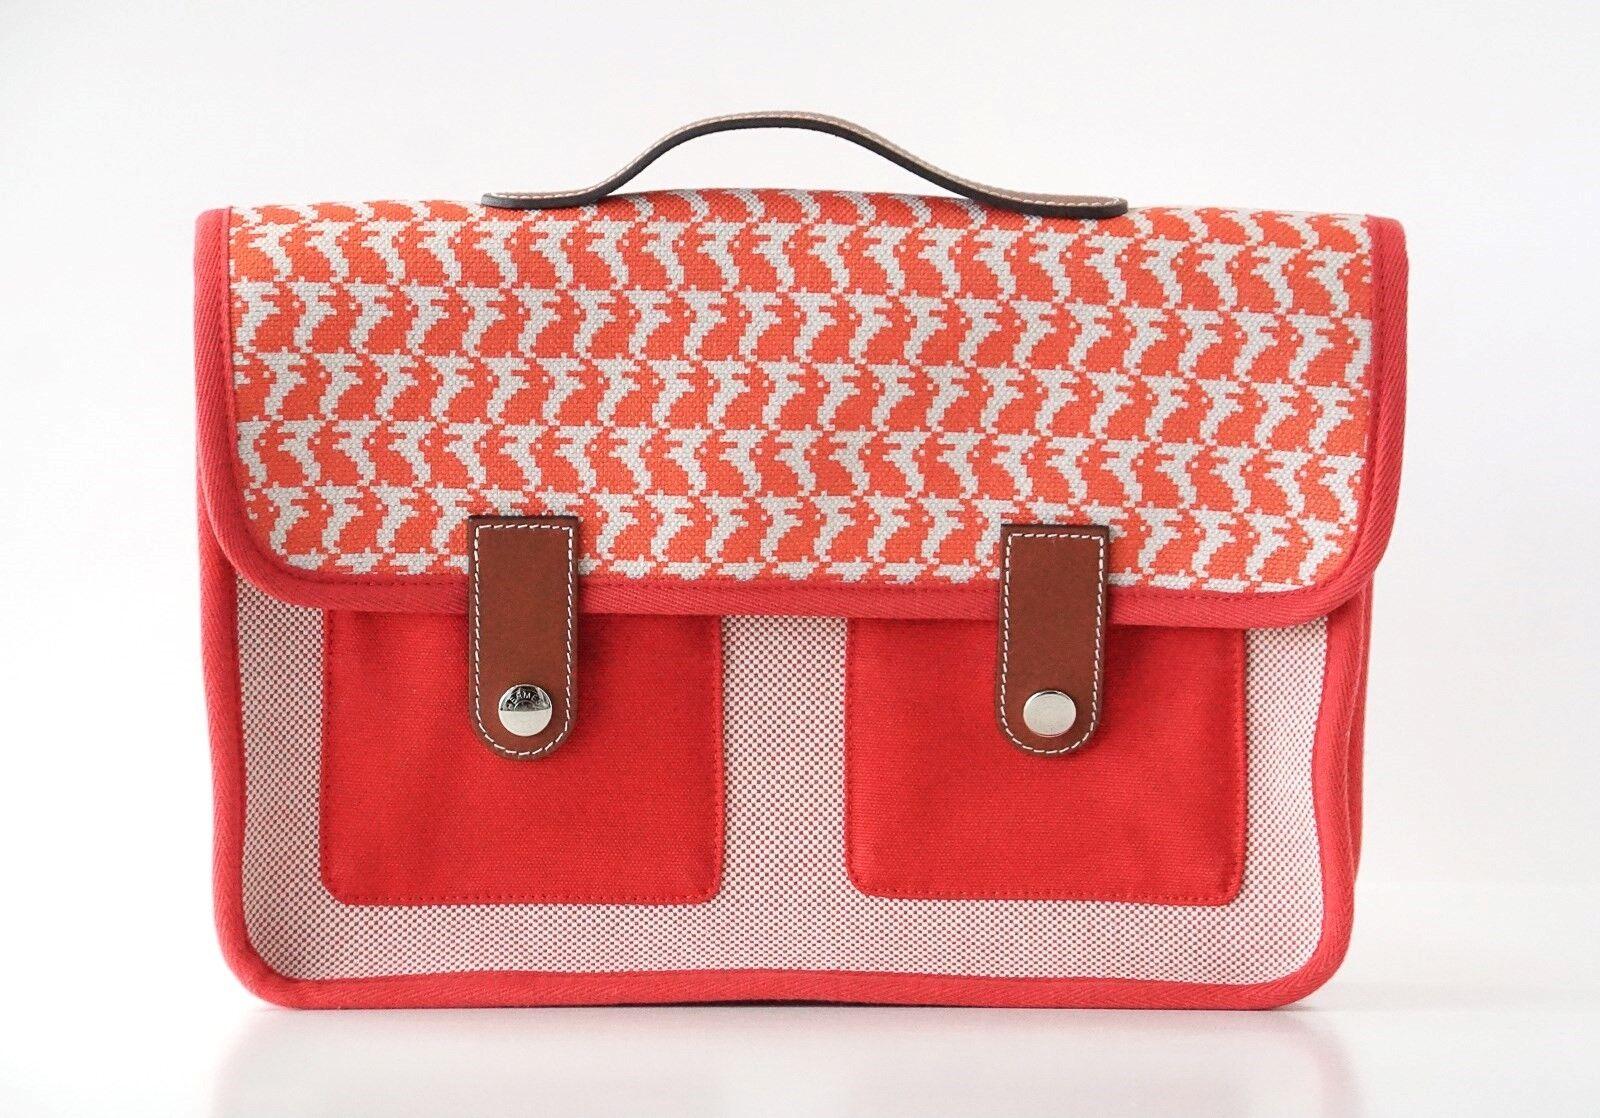 Hermes Bag Animaux Pixel Backpack Printed Red Canvas Ltd